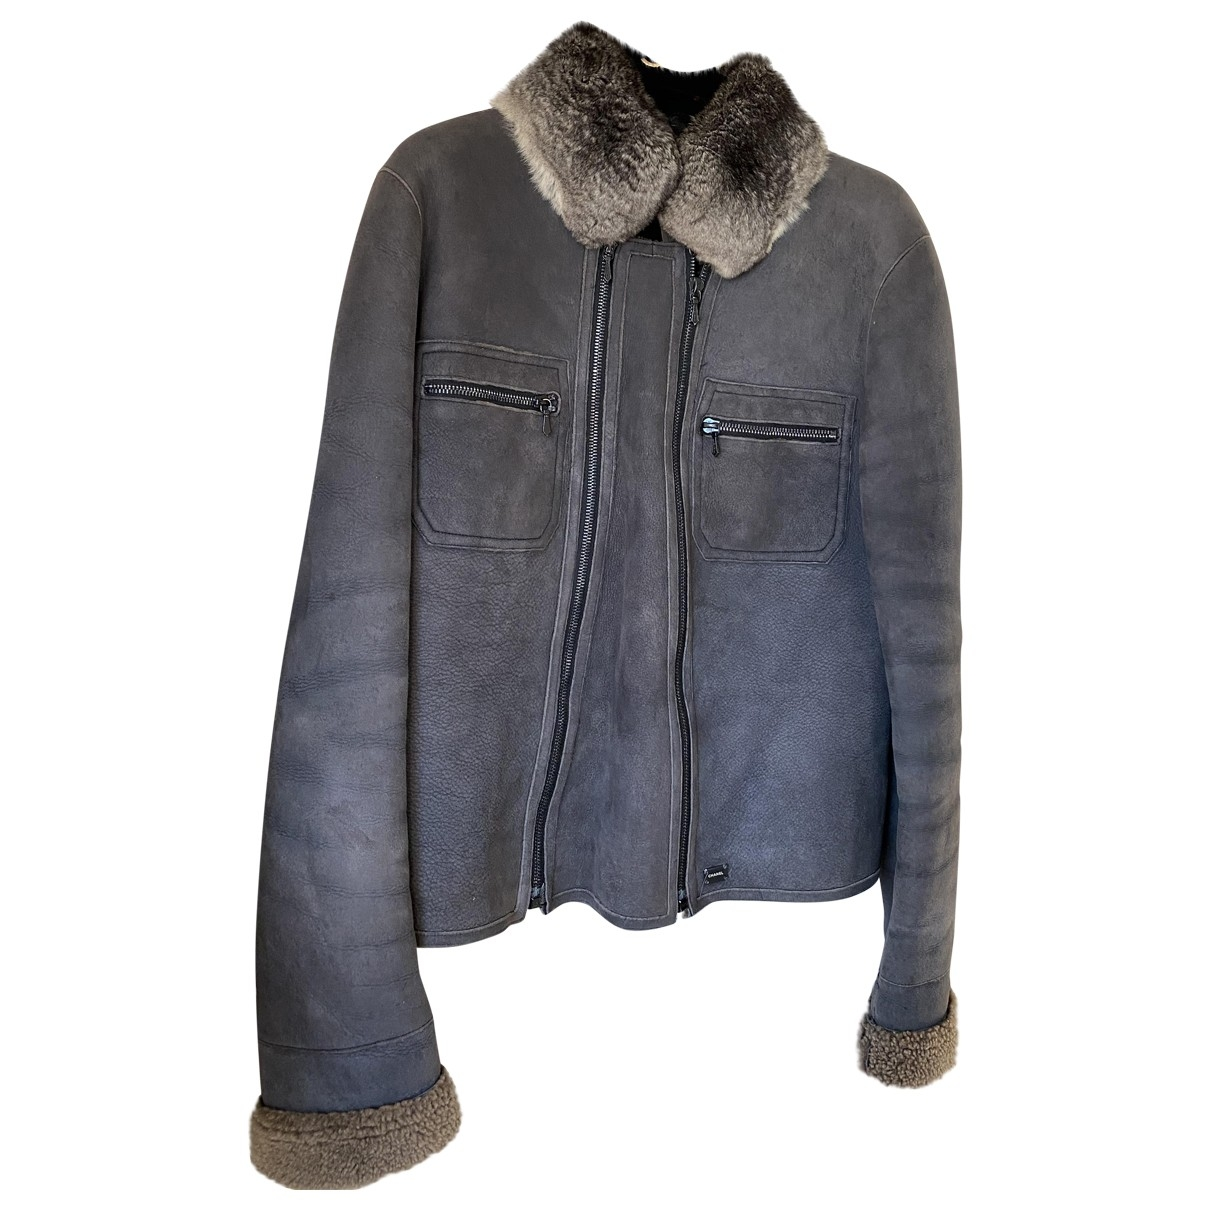 Chanel \N Grey Leather jacket for Women 38 FR